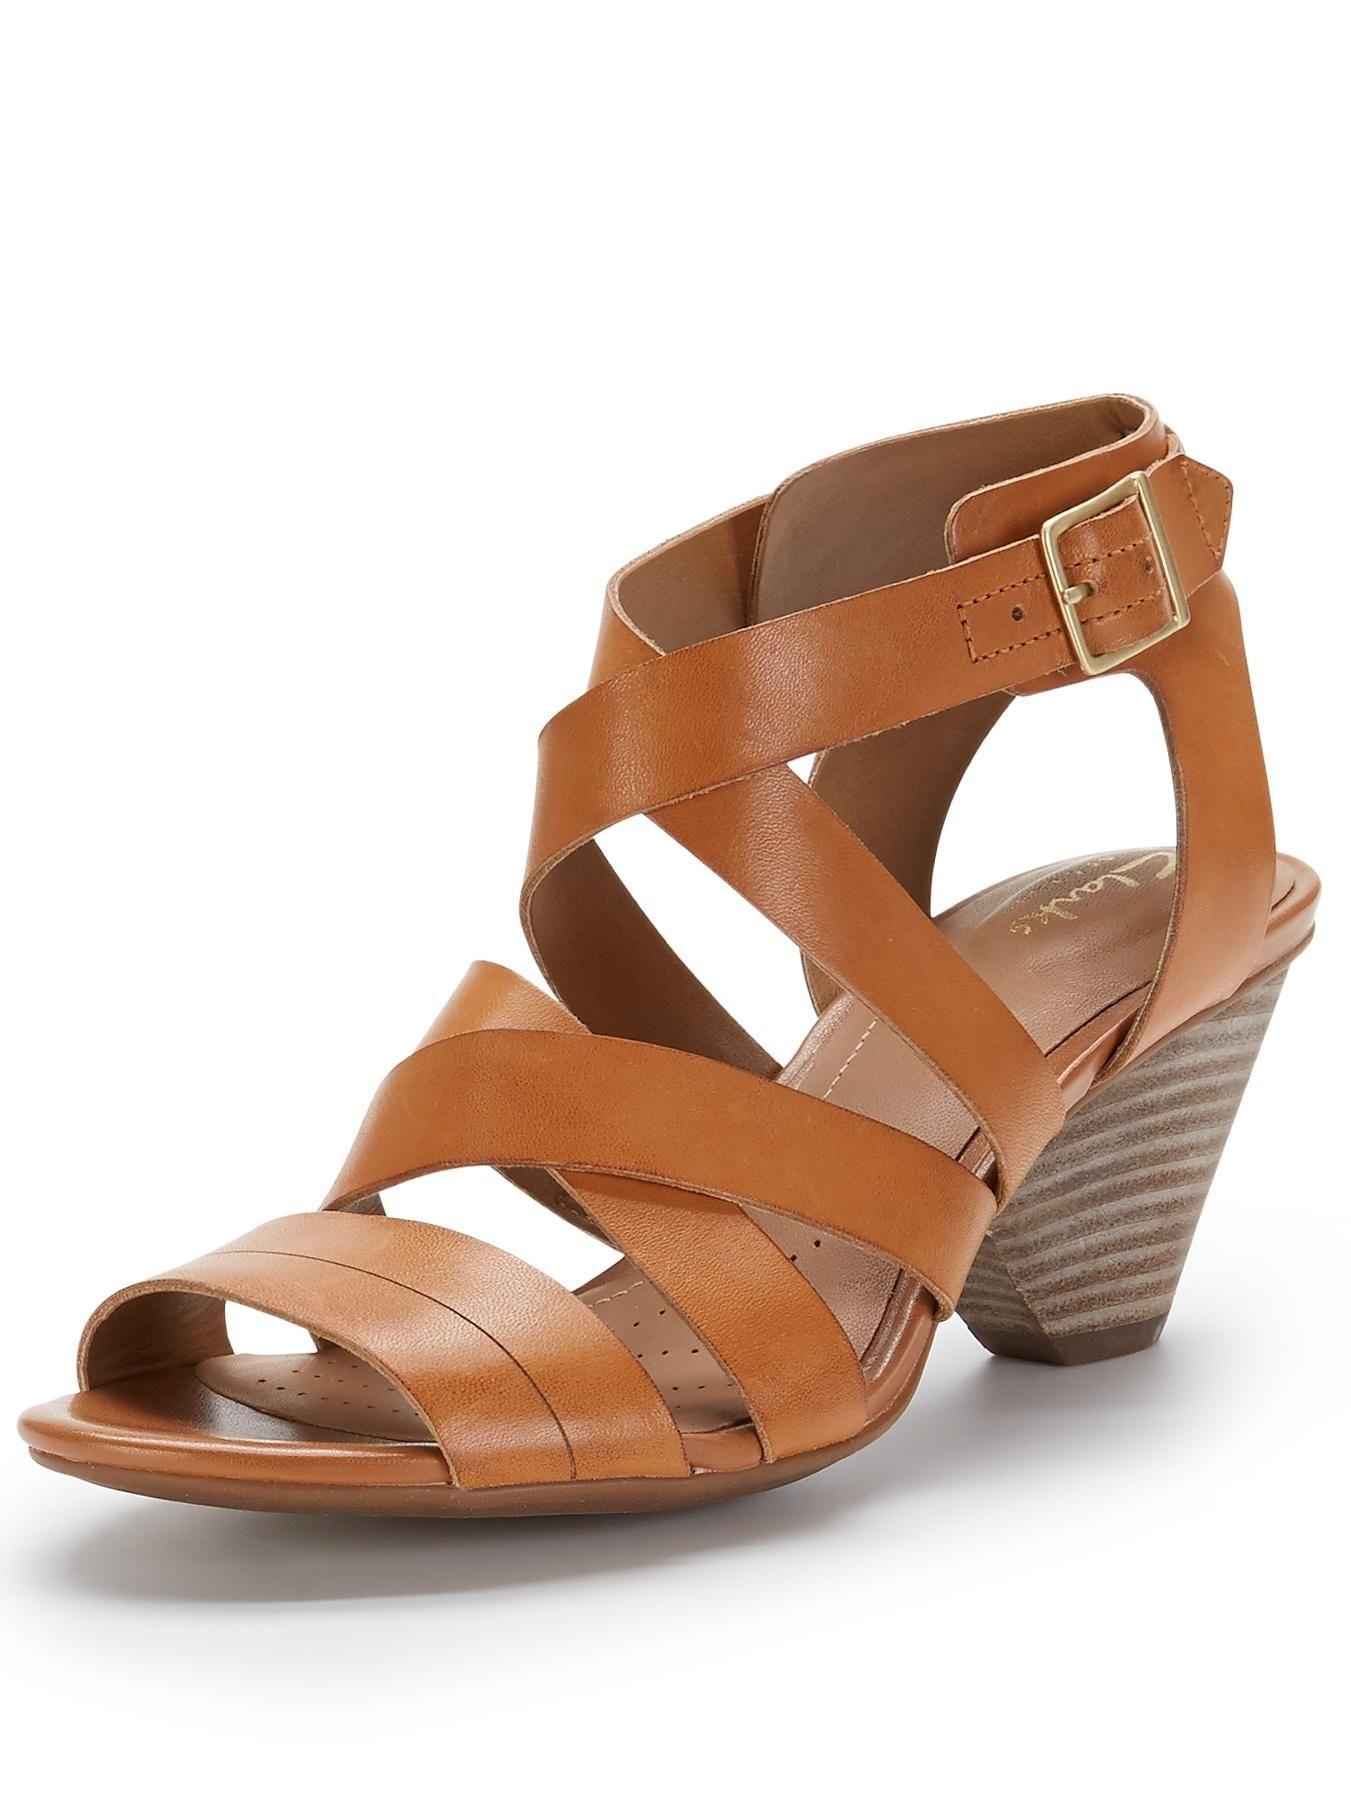 d80fa236a0d Clarks Ranae Estelle Low Strappy Sandals